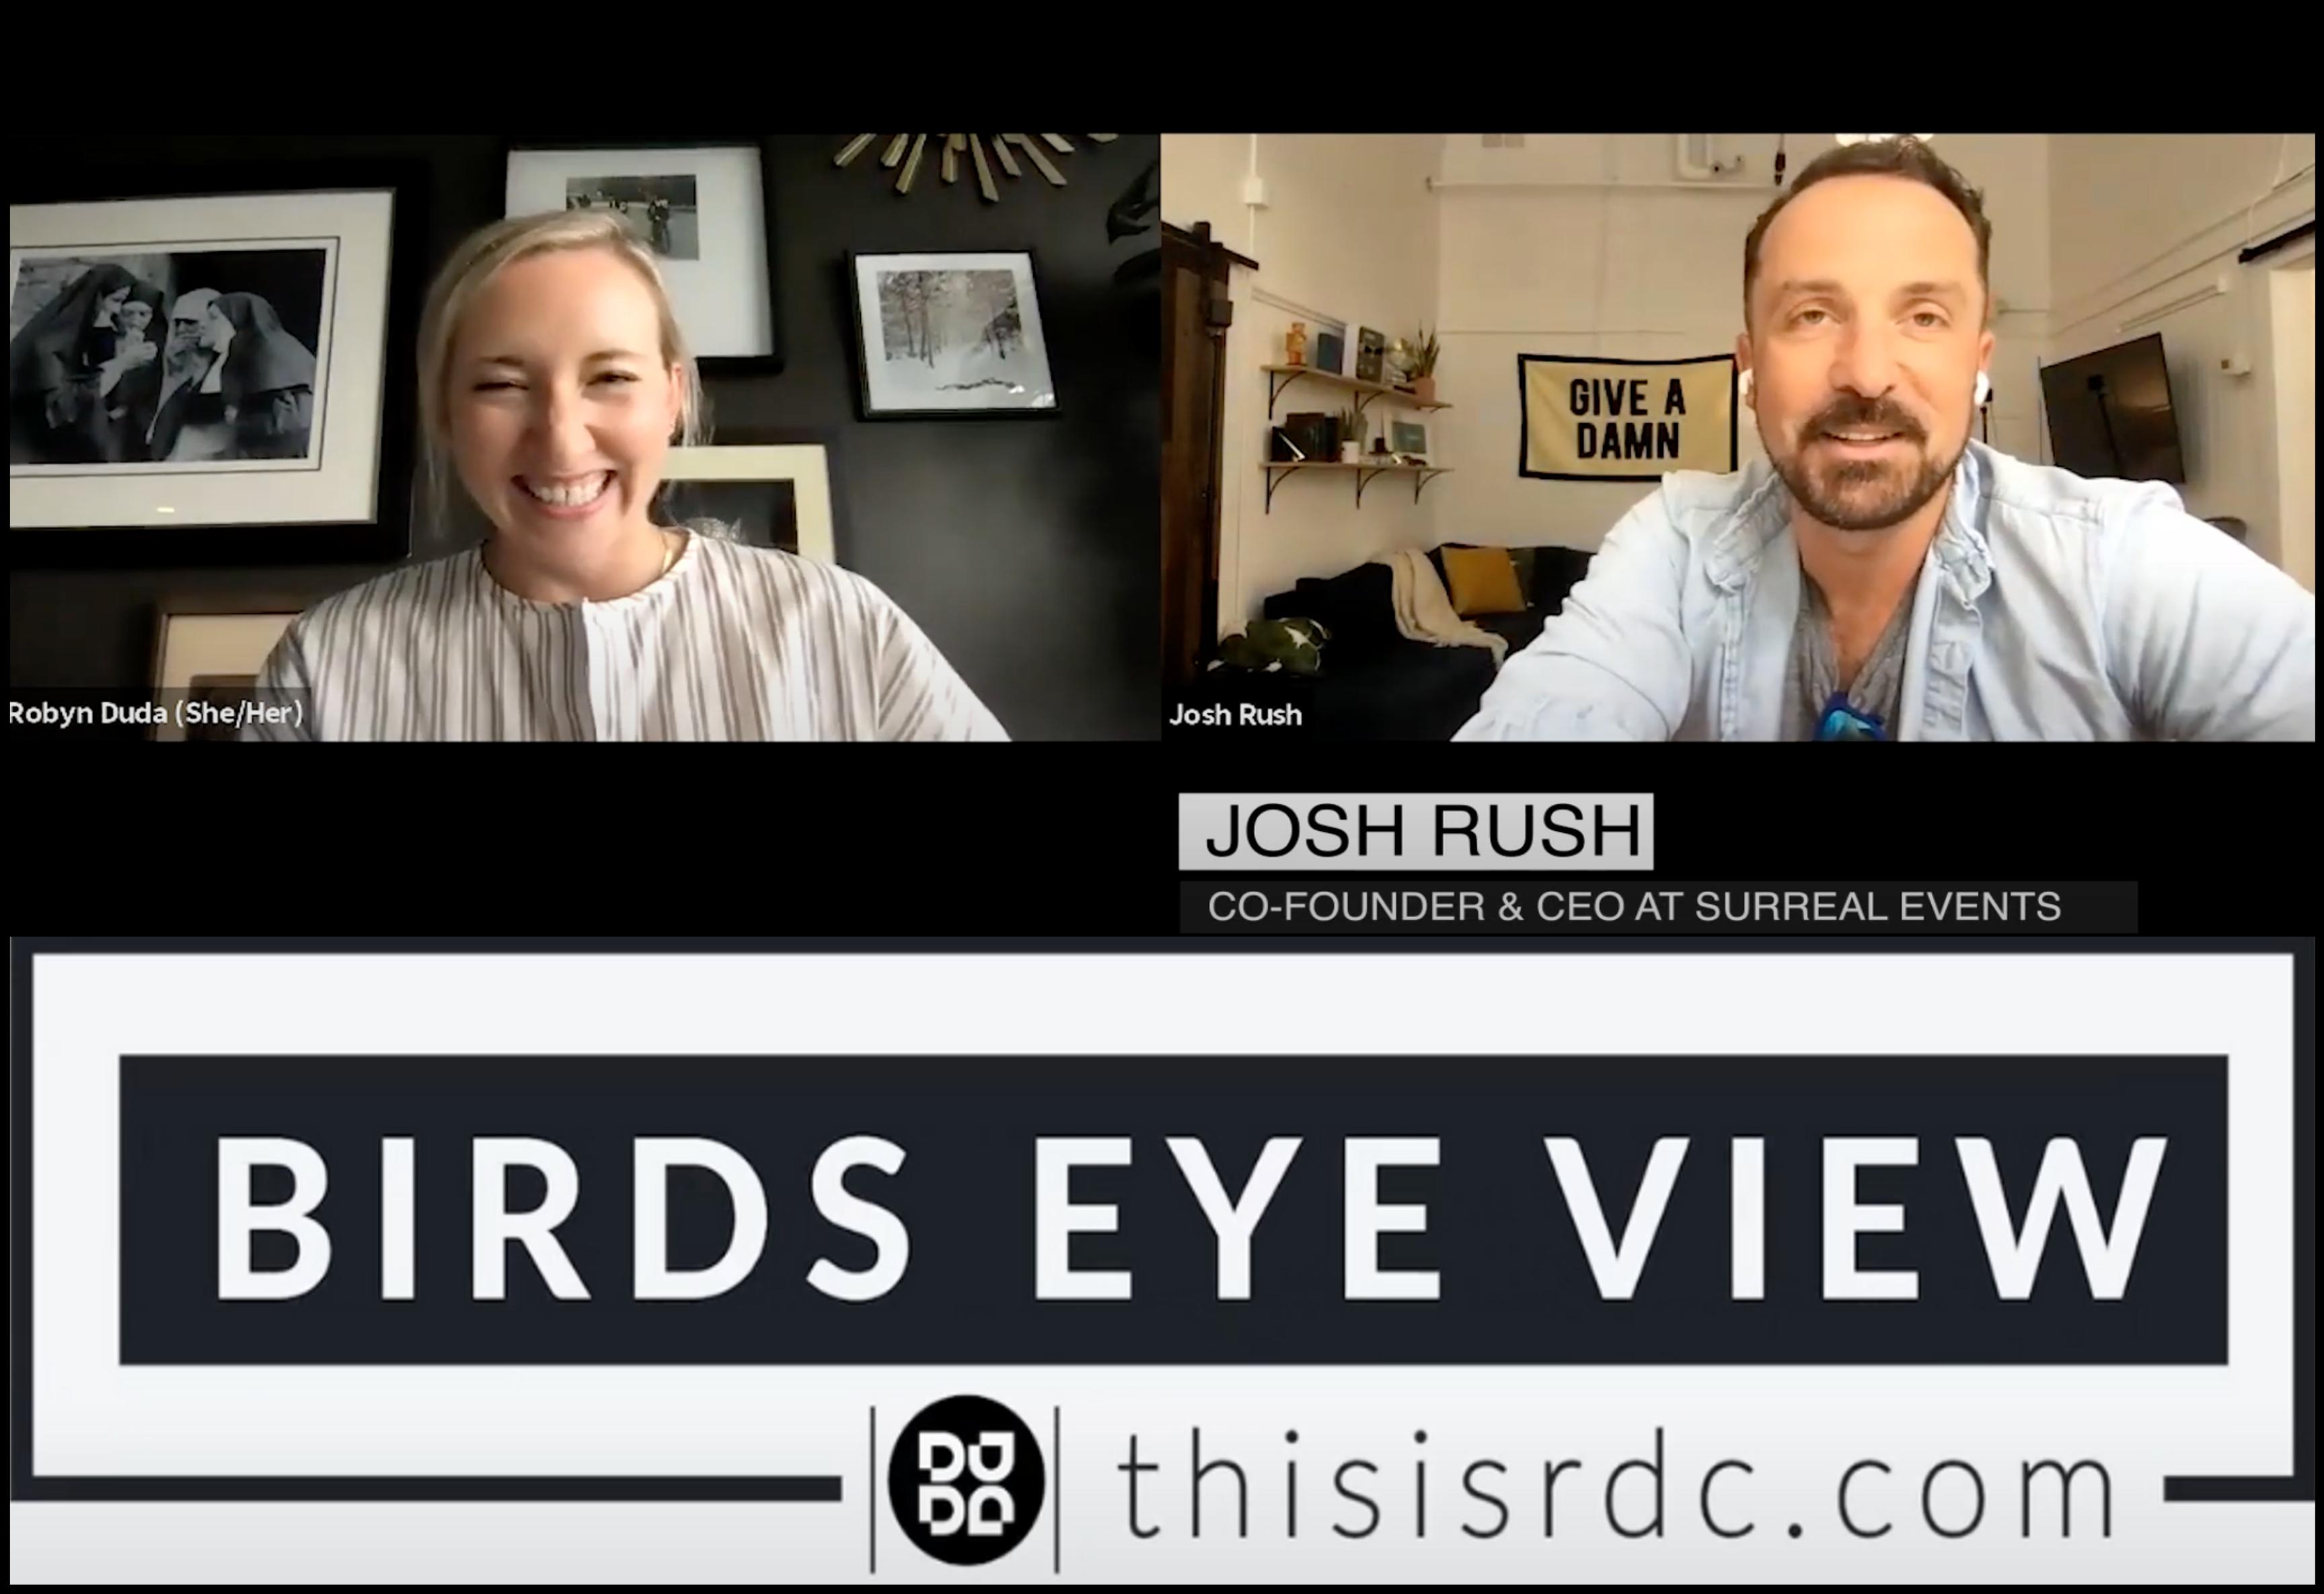 BIRD'S EYE VIEW PODCAST TALKS WITH SURREAL'S JOSH RUSH